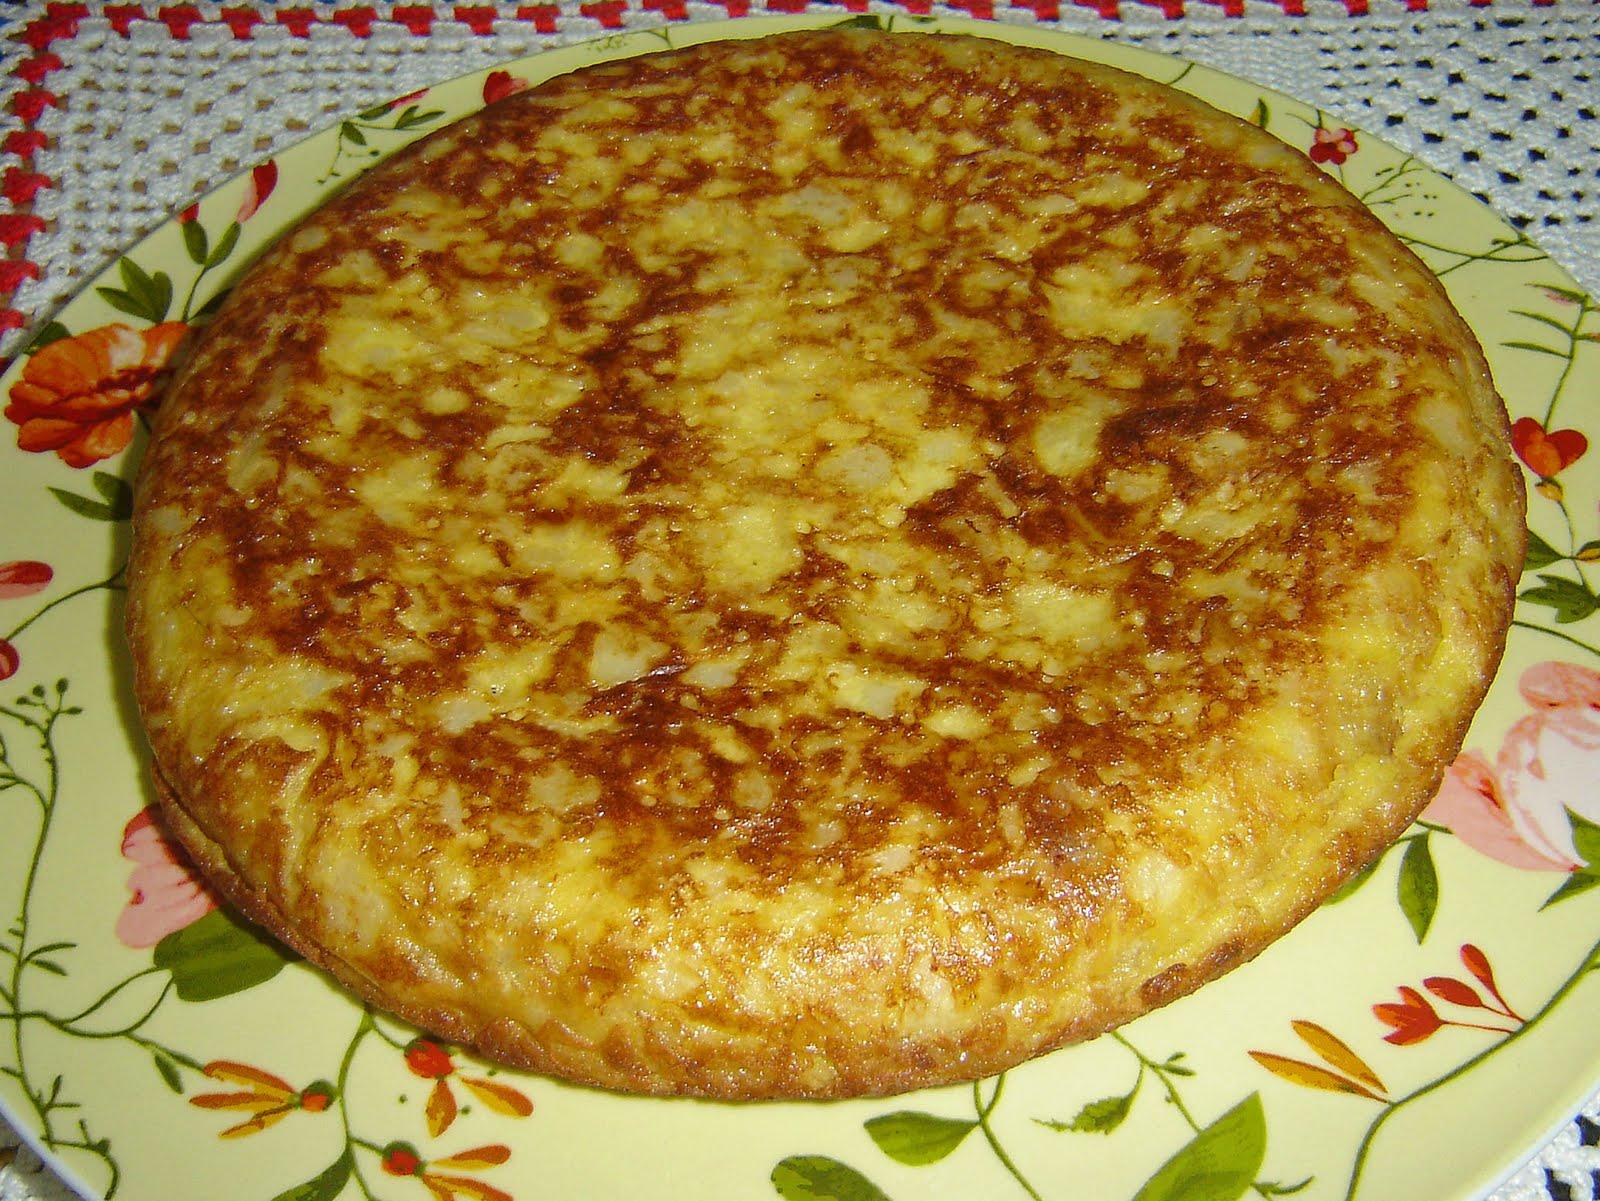 Tortilla+de+patata.jpg (1600×1201) | Lo que le gusta a Zoe ...